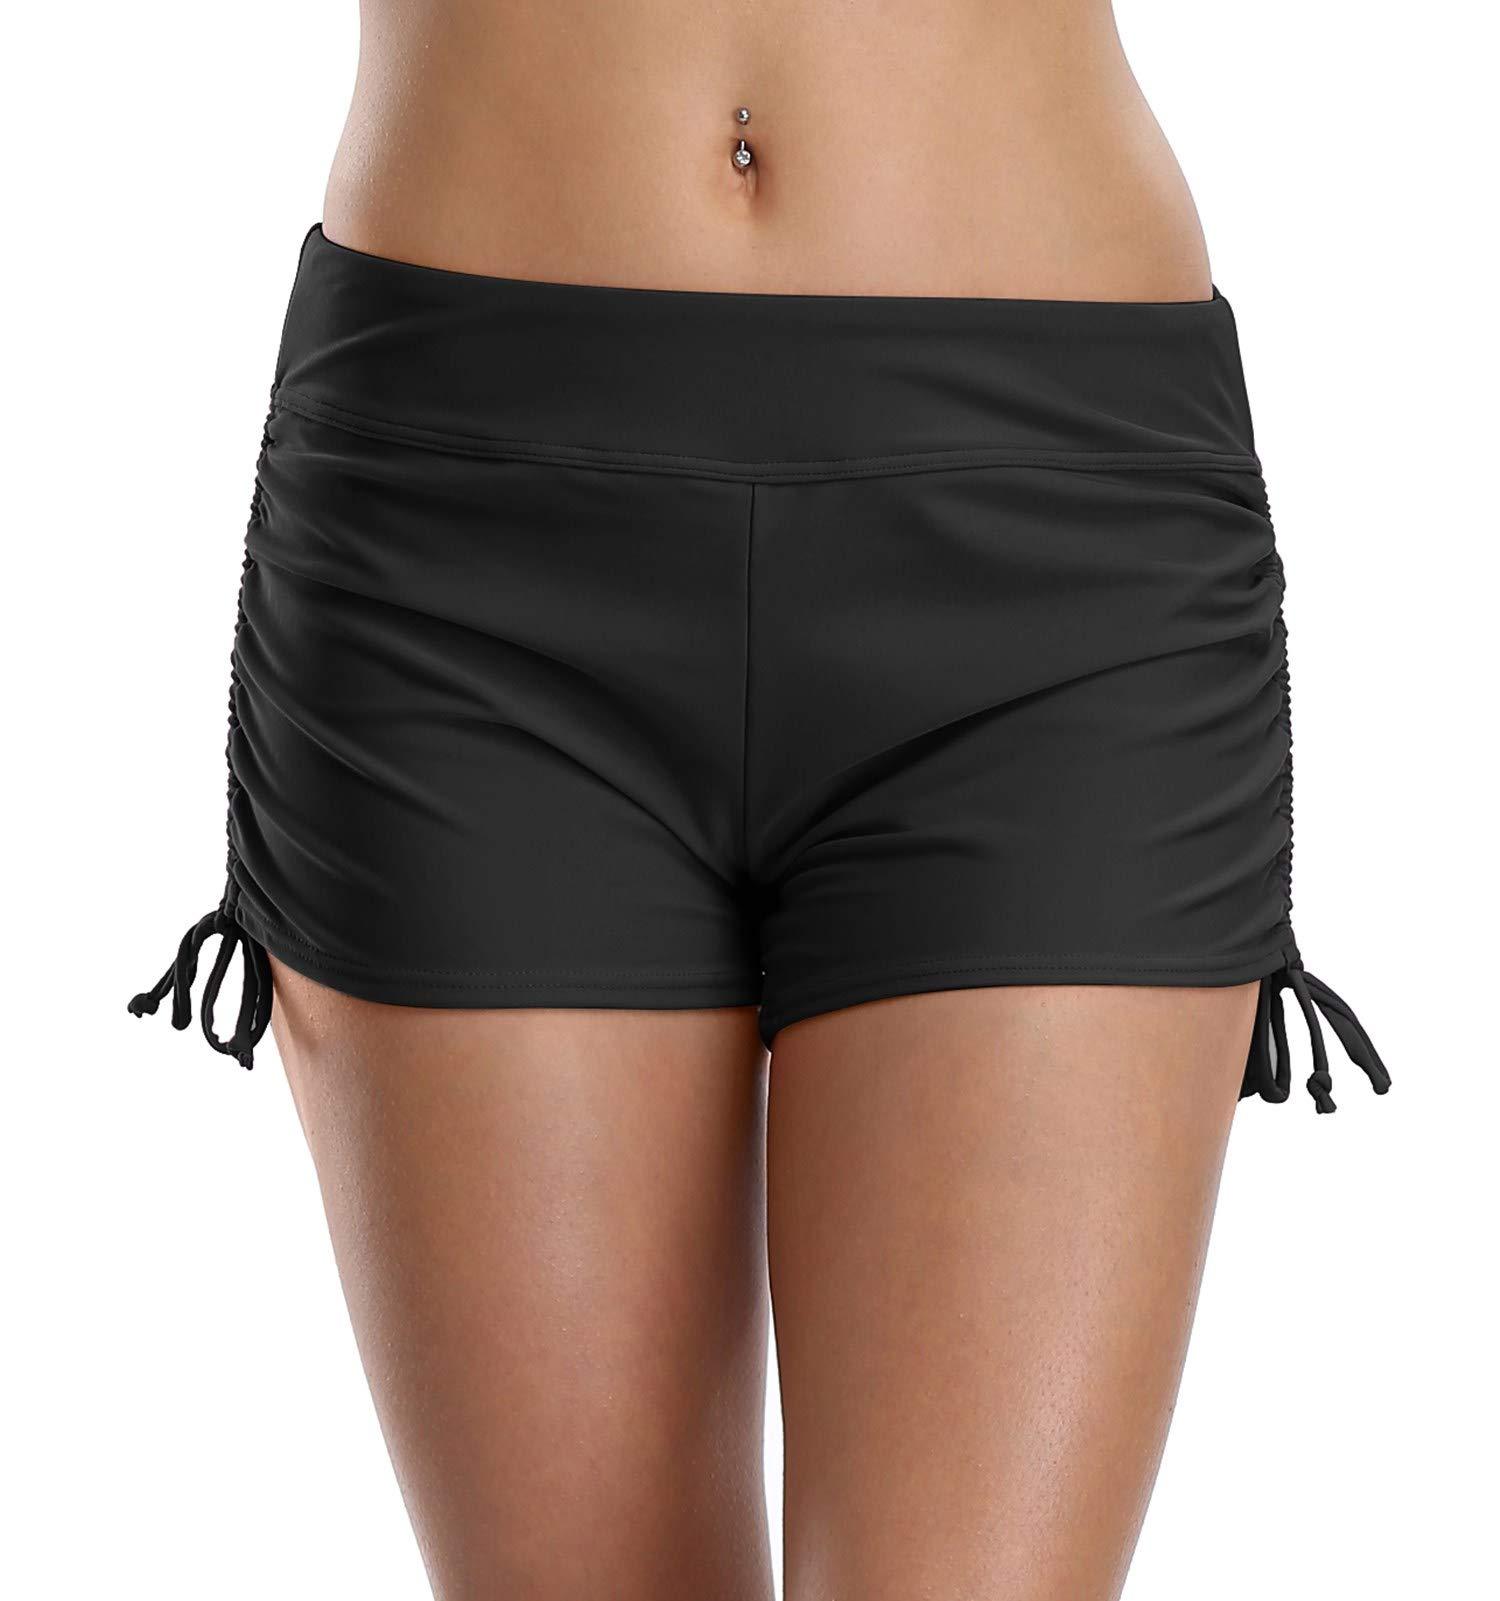 Anwell Women's Swim Board Short Boyleg Tie Side Swimsuit Bottom Black Medium by Anwell